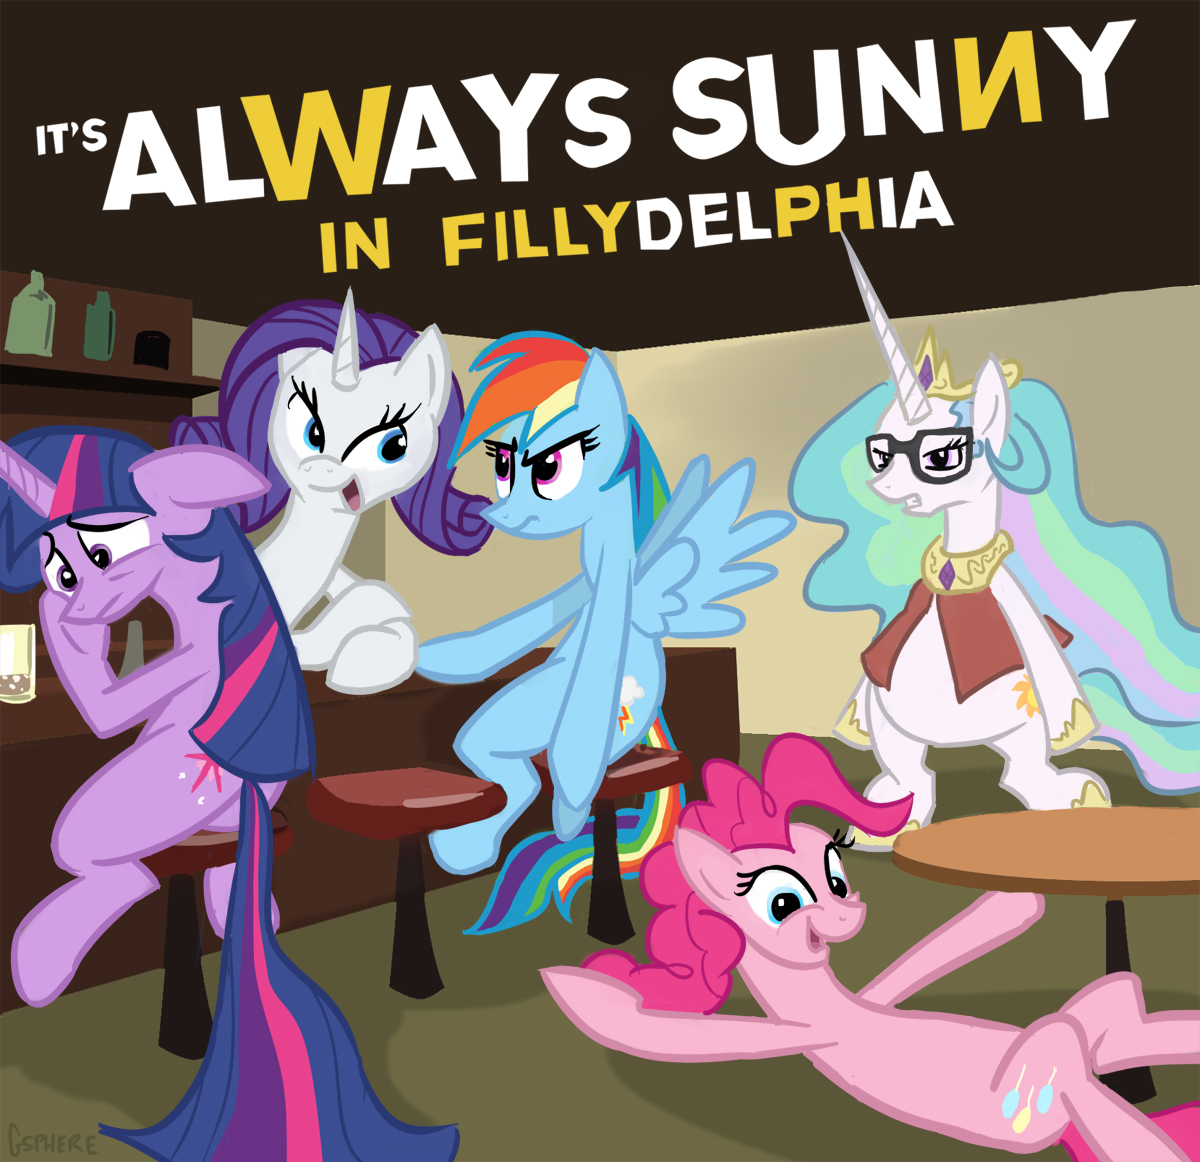 Always Sunny in Fillydelphia by GSphere